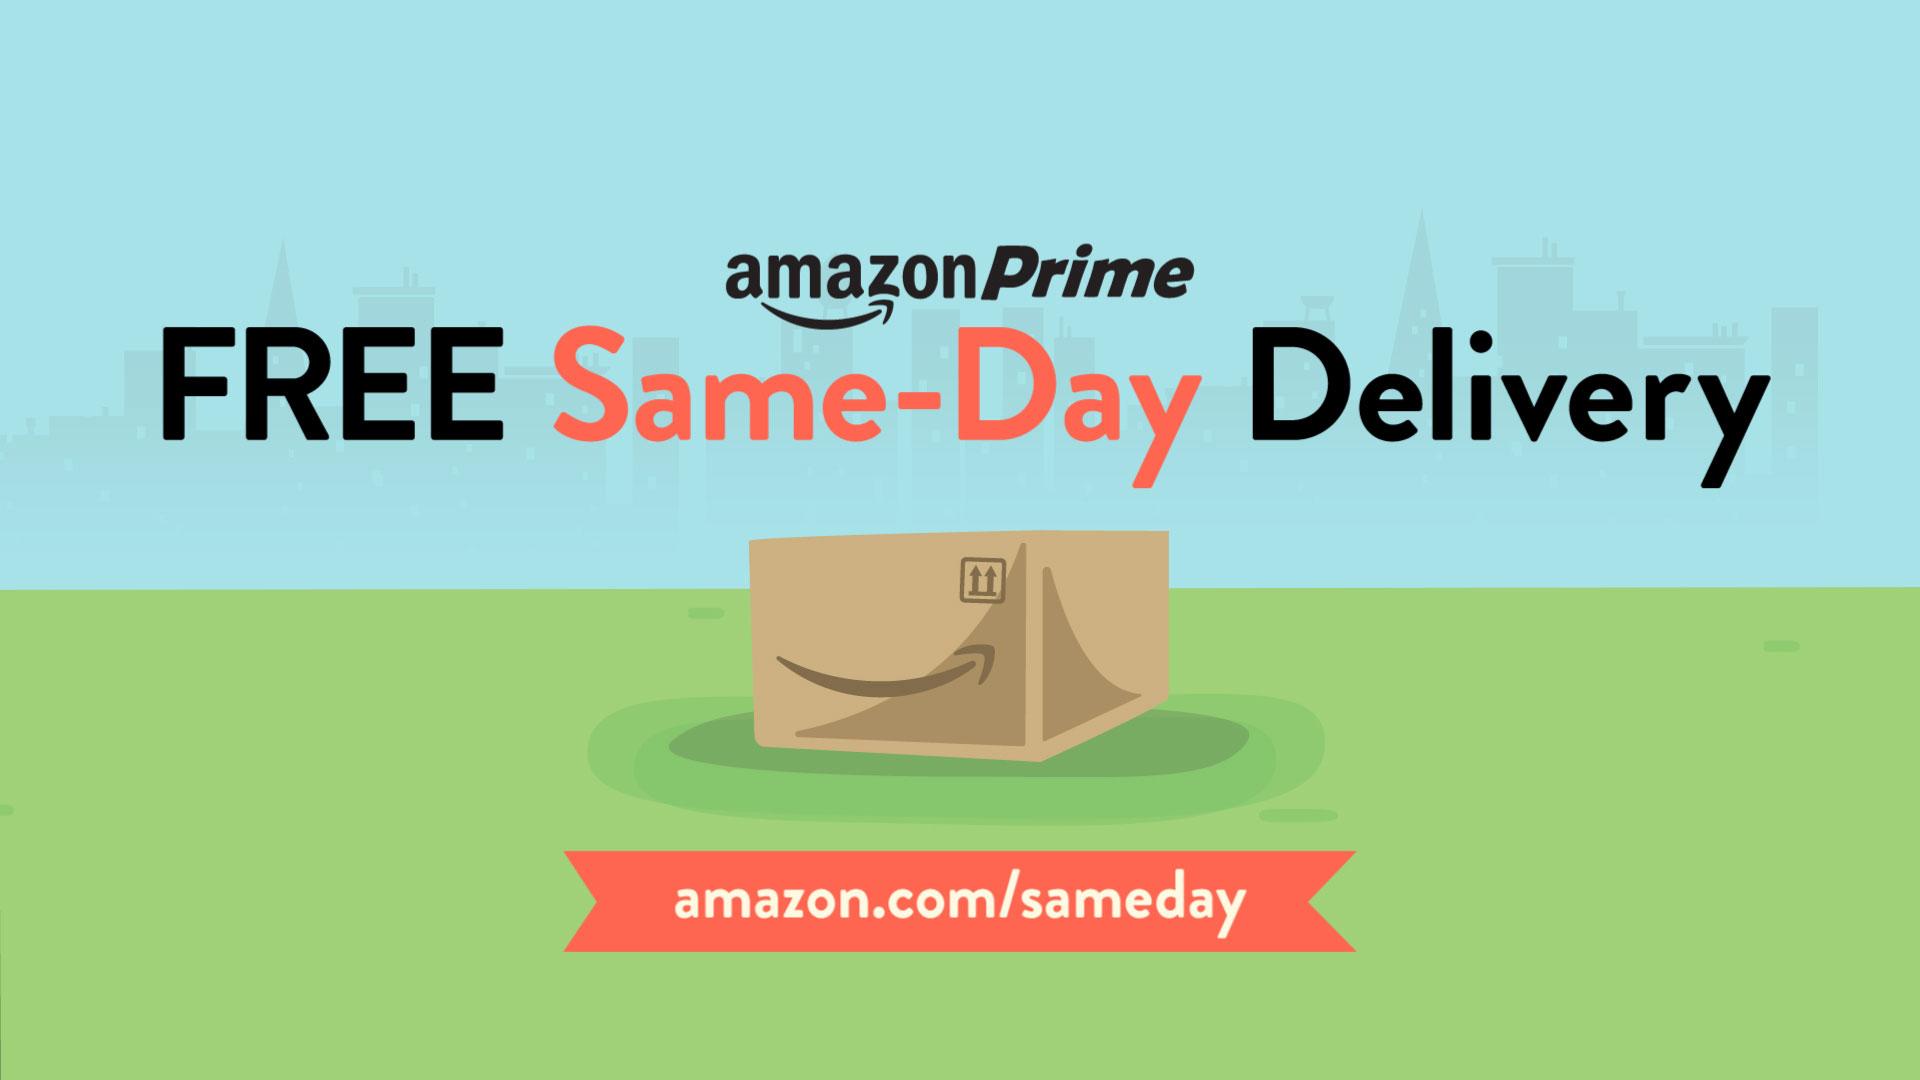 ca2b62668 Amazon Prime FREE Same-Day Delivery